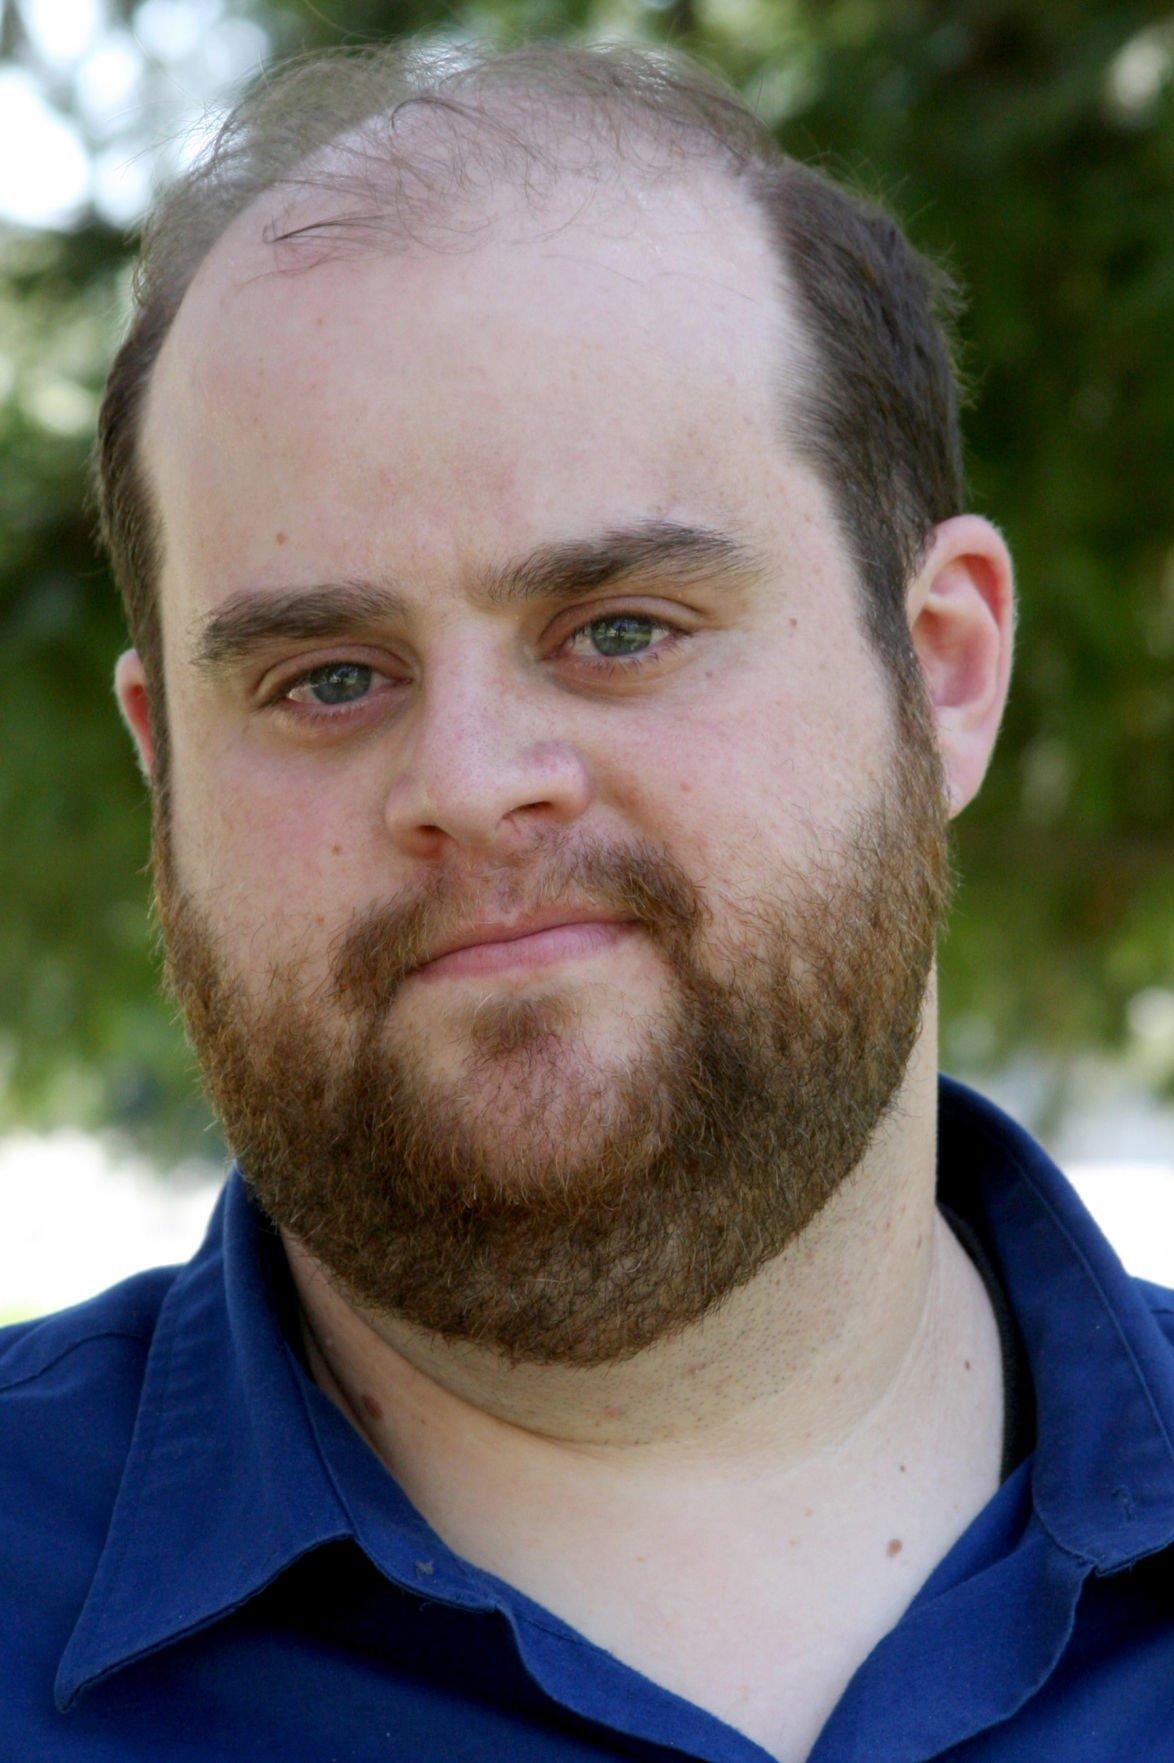 Vocalist: Brian Lummis